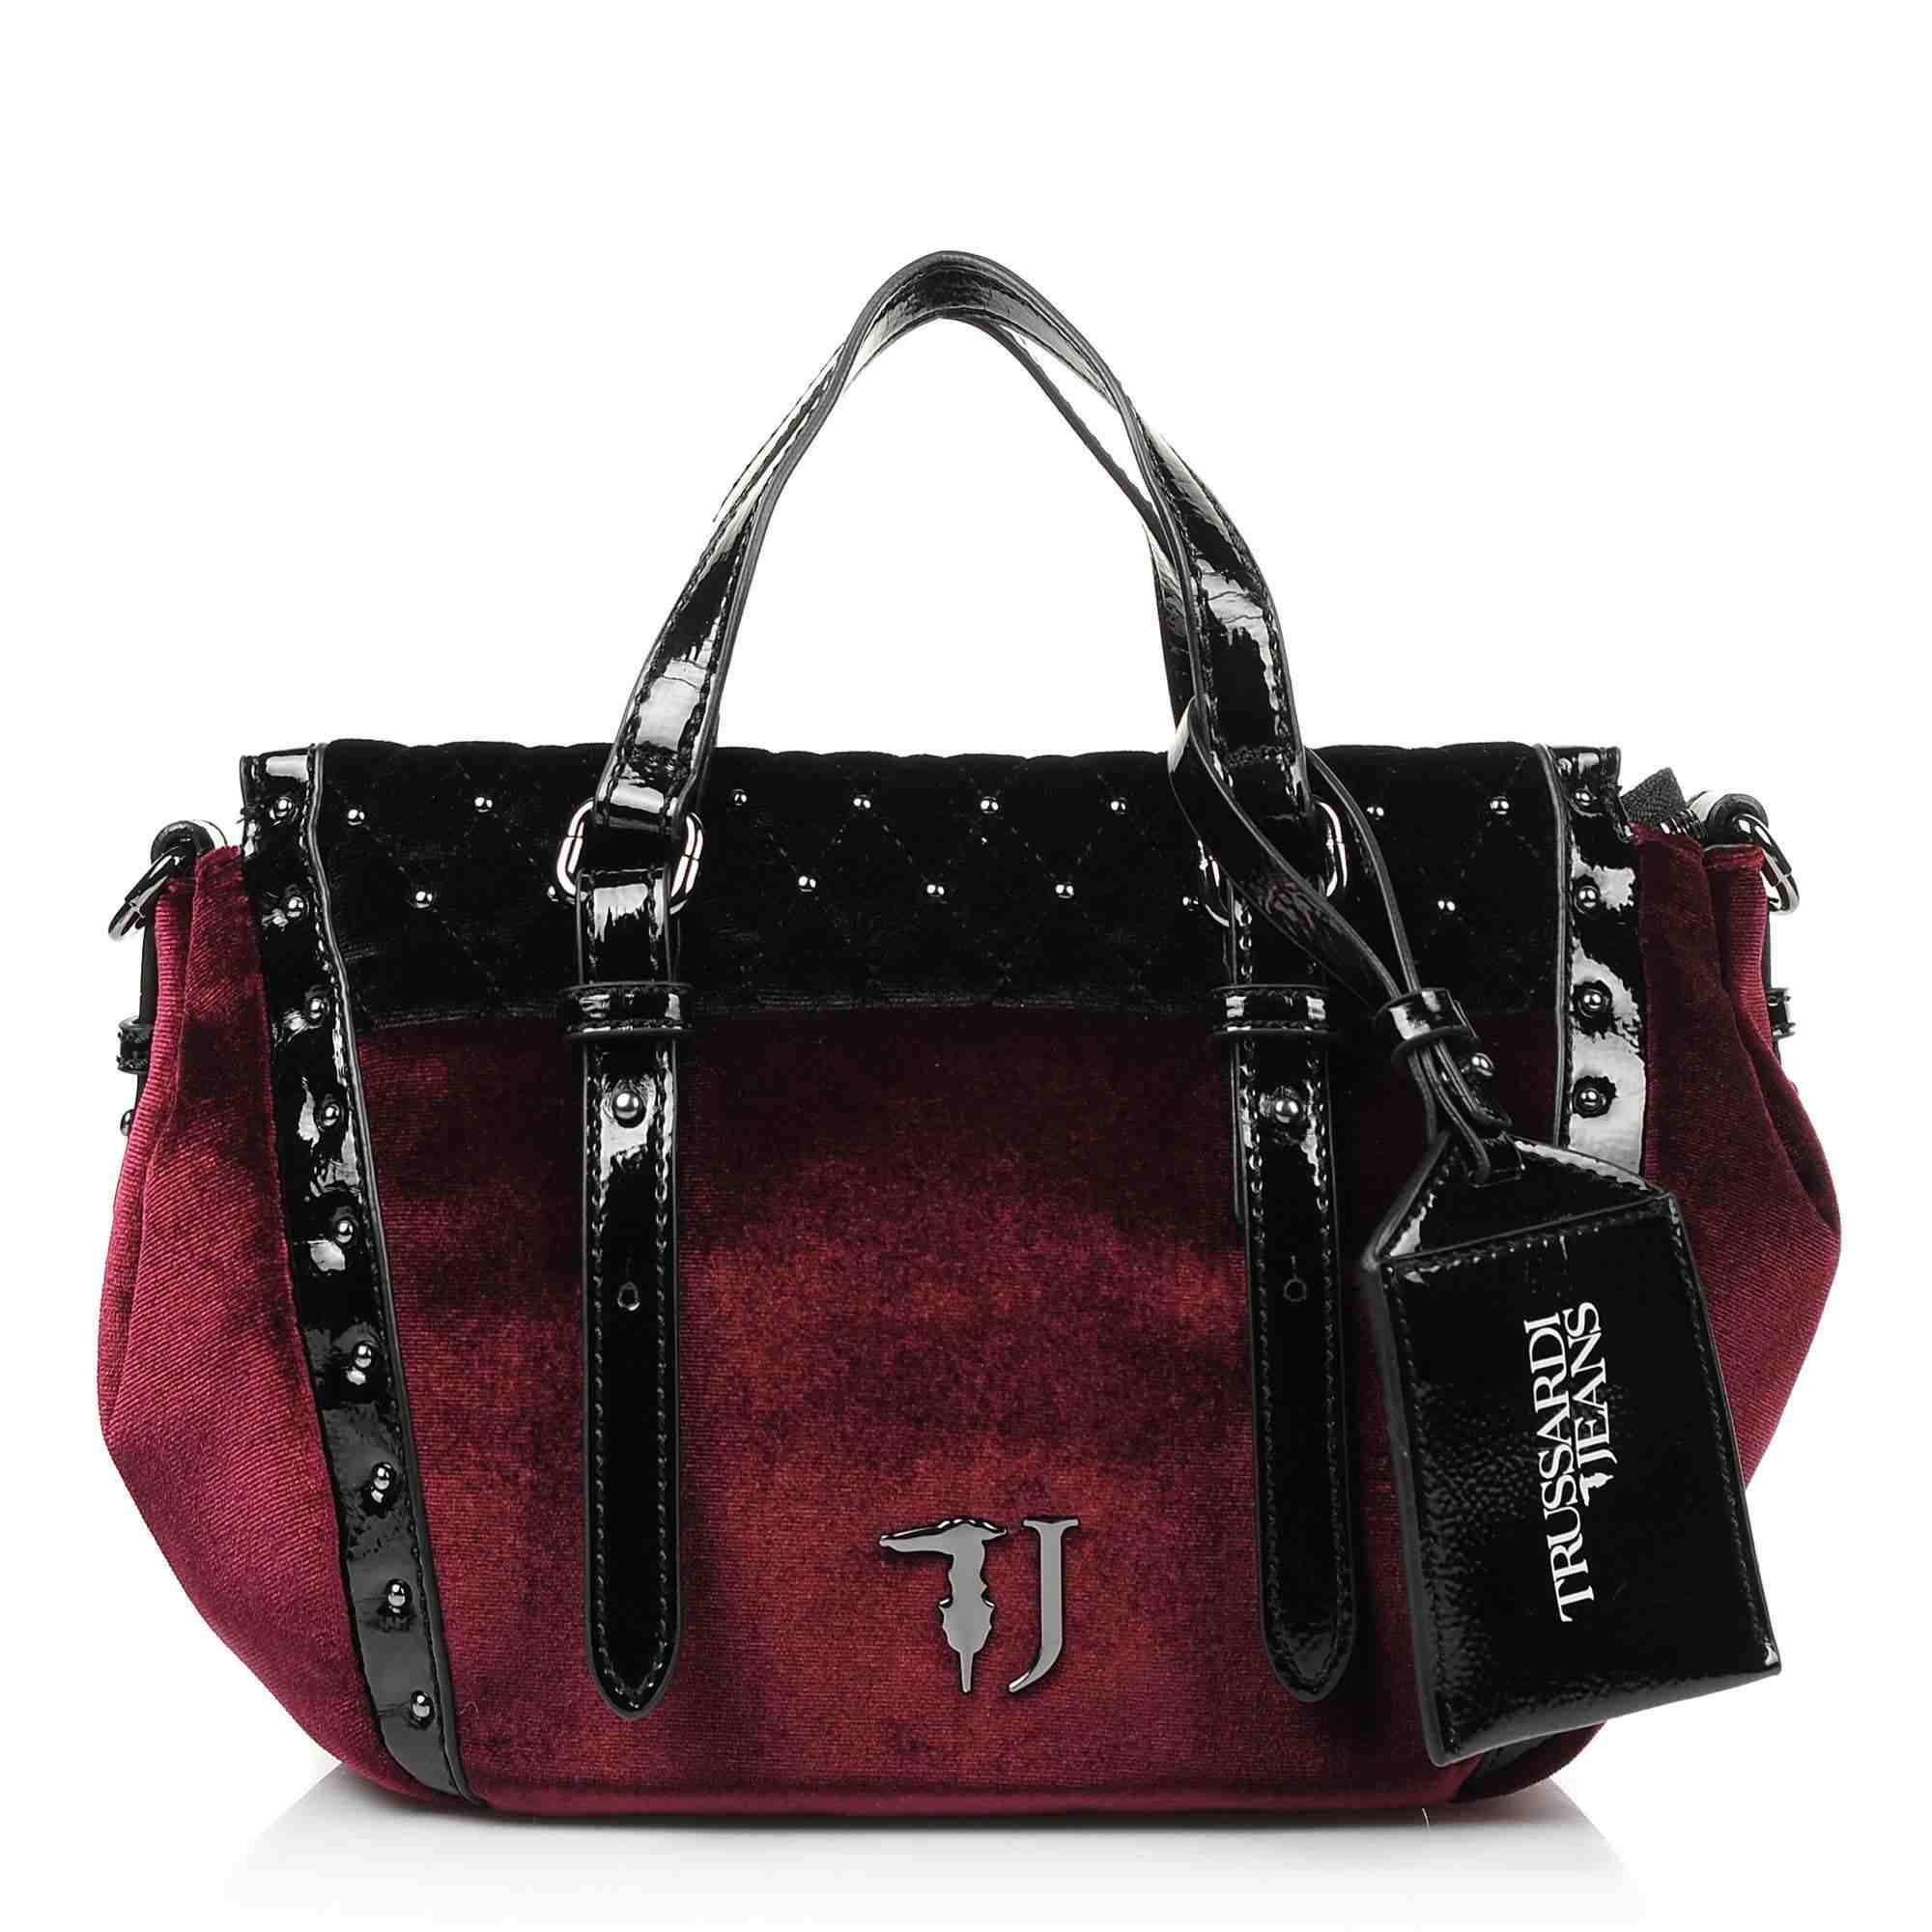 Tote Τσάντα Trussardi Jeans Portulaca Shoulder Bag Velvet 75B00538